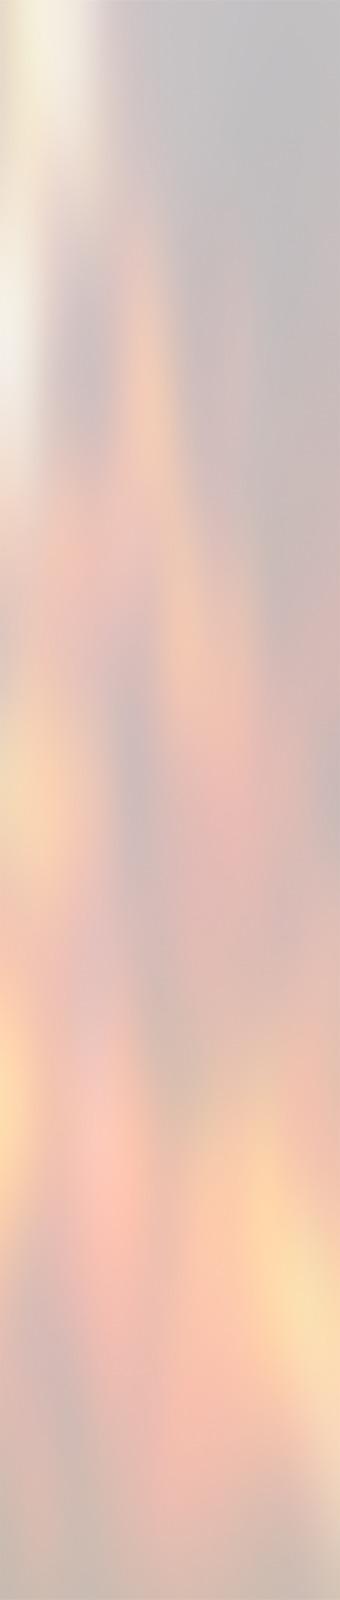 Background2.jpg?versionId=Fs0AwktS4yOOjZ